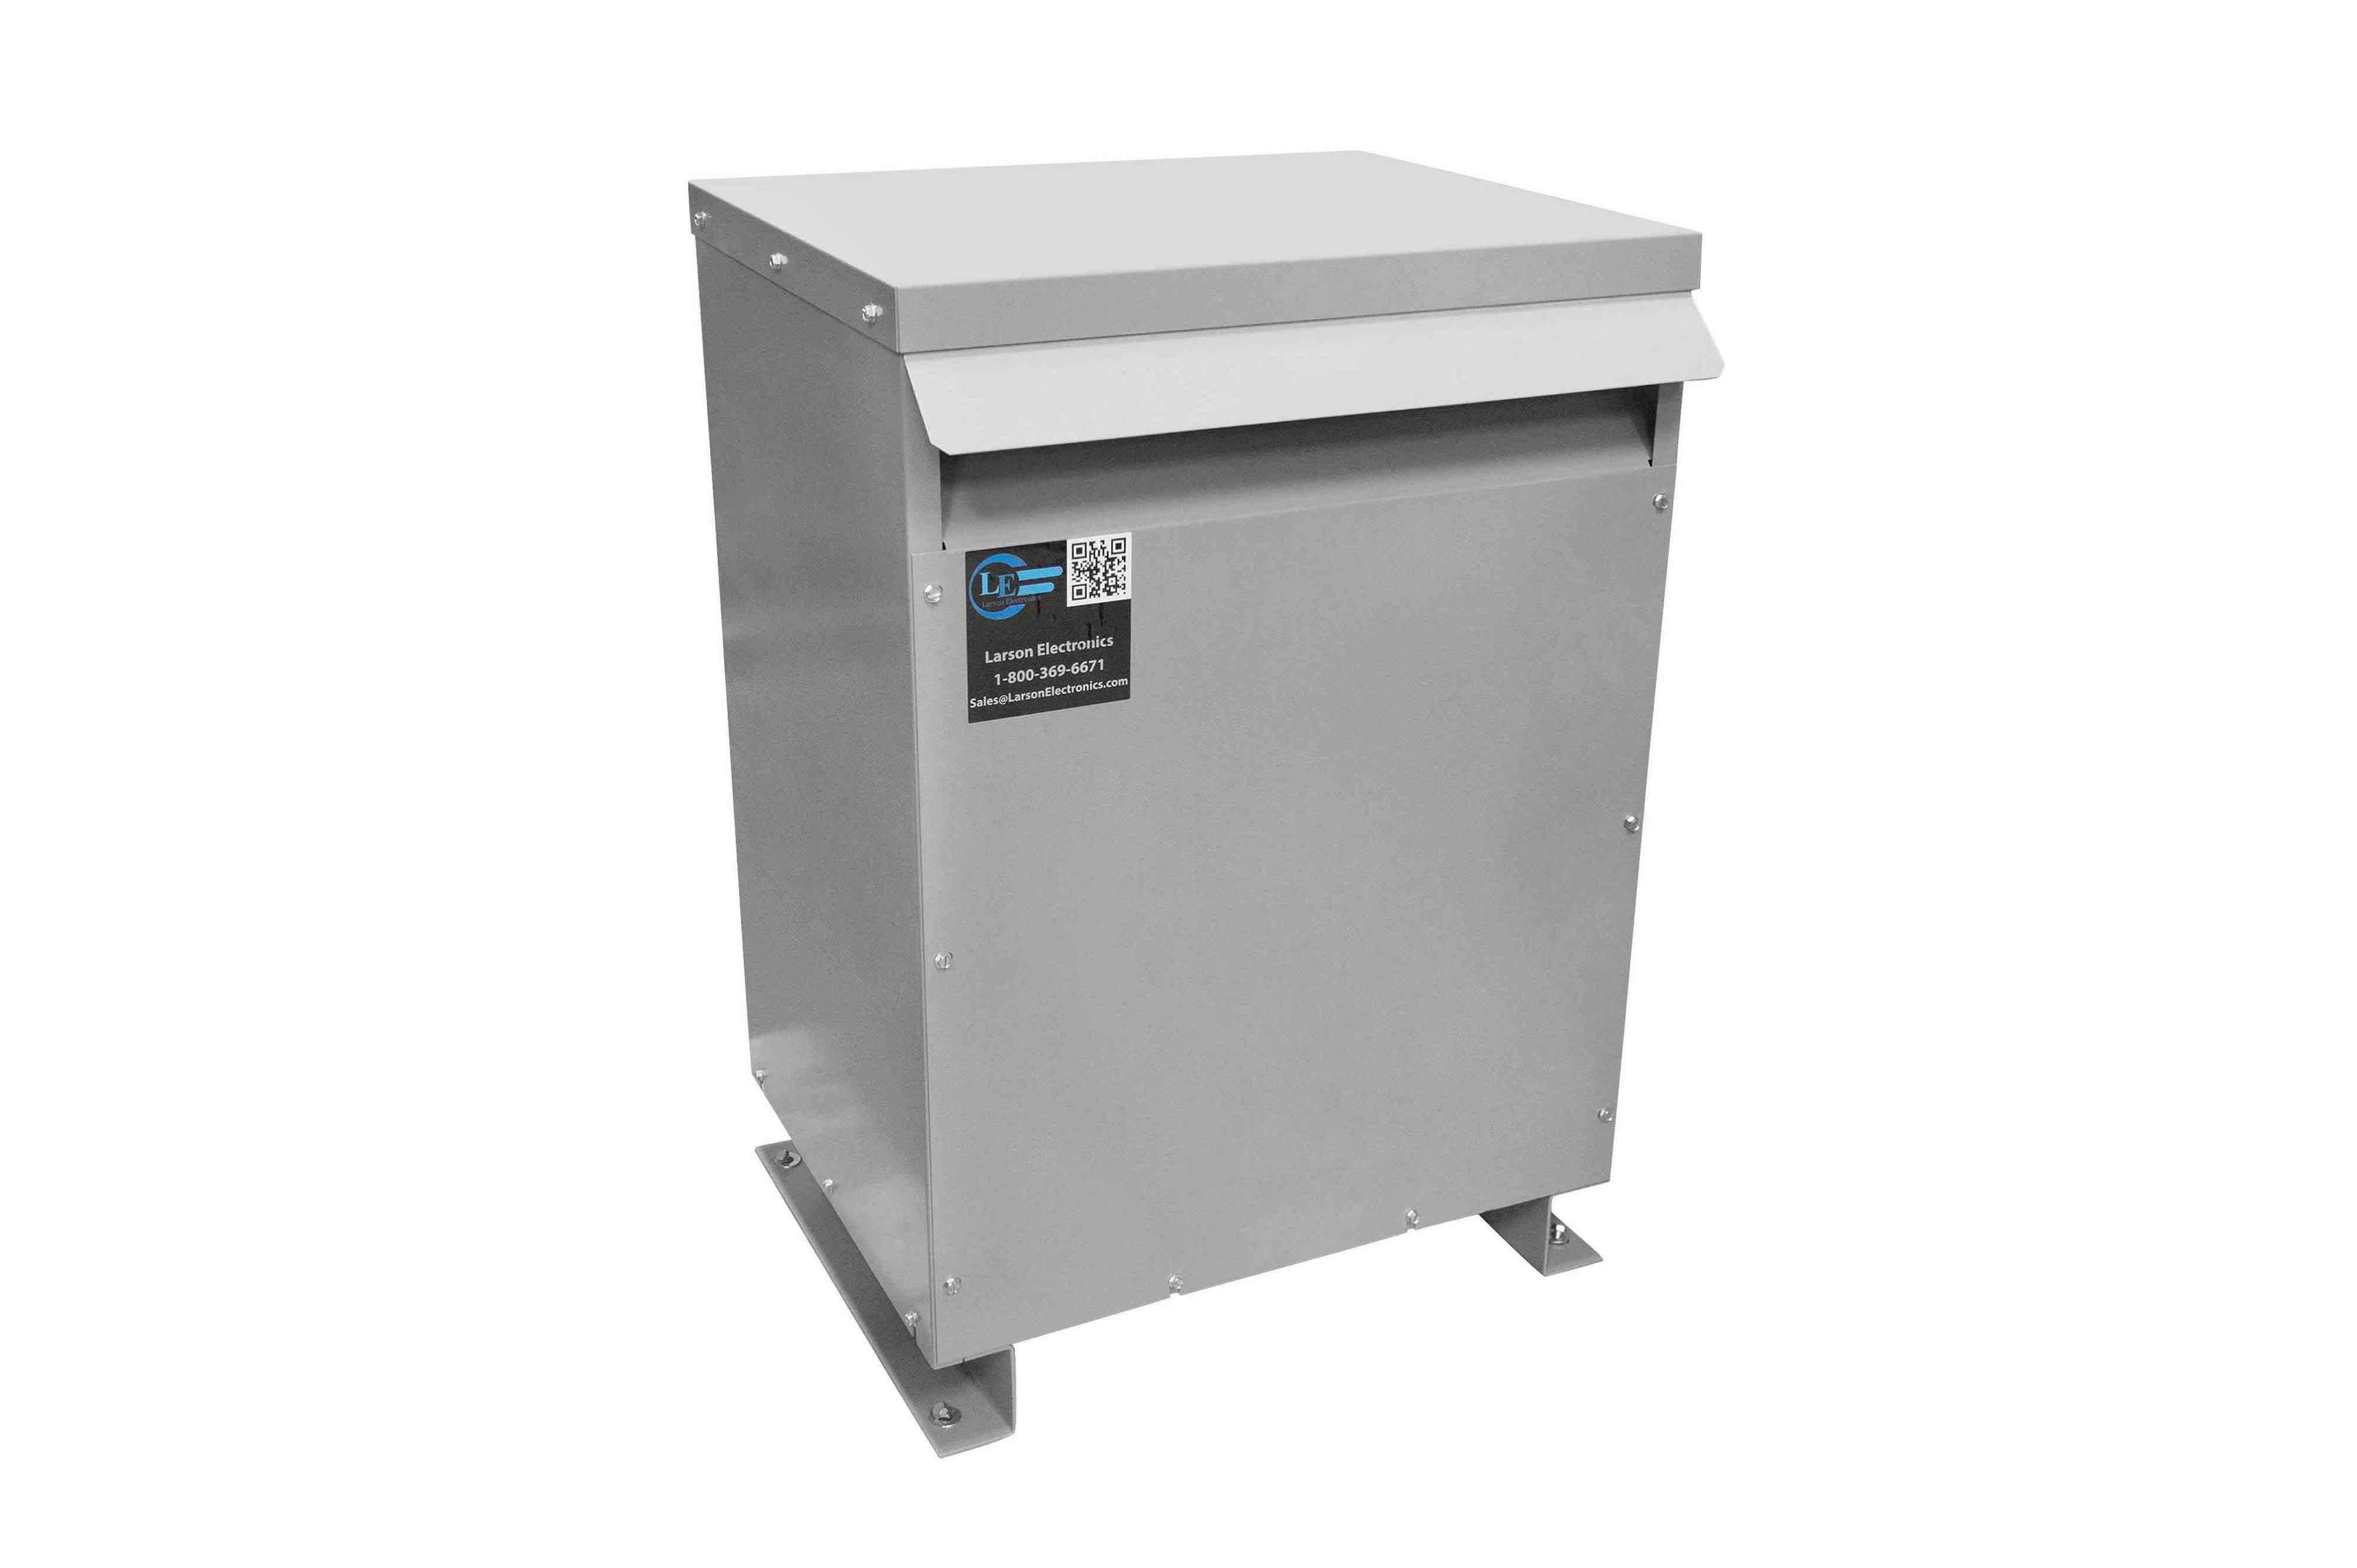 750 kVA 3PH DOE Transformer, 575V Delta Primary, 480Y/277 Wye-N Secondary, N3R, Ventilated, 60 Hz